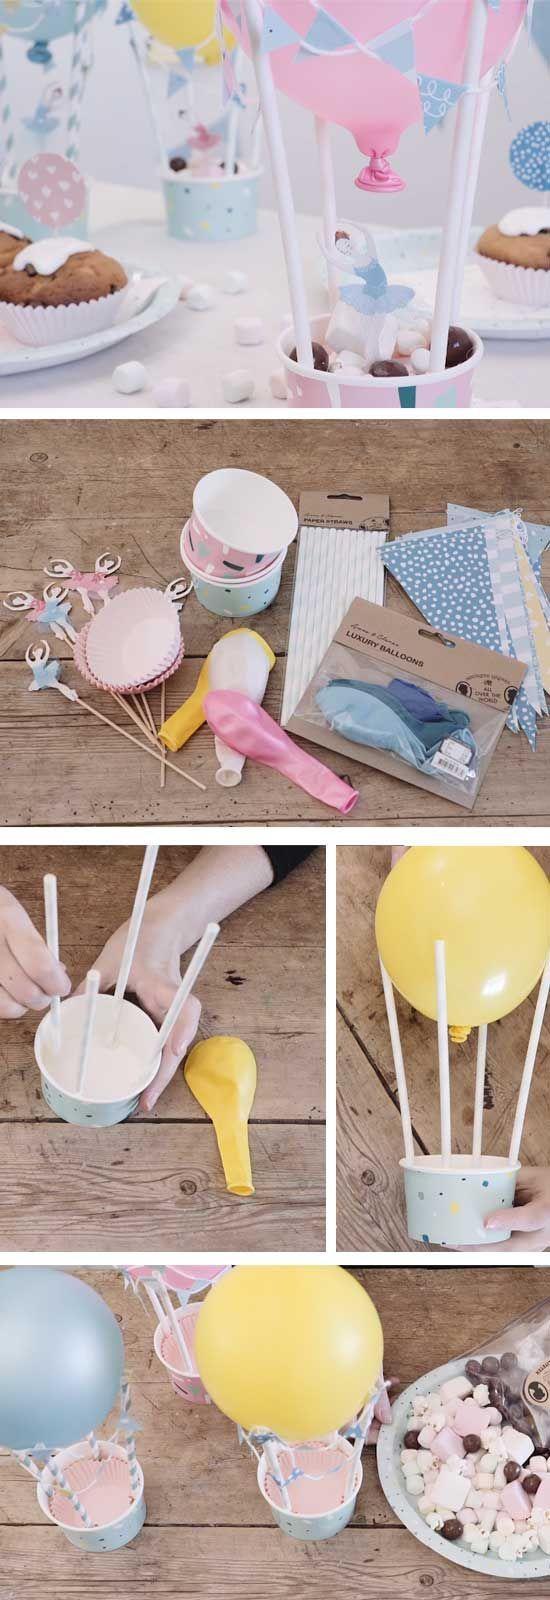 55+ Easy Baby Shower Ideas for Girls – Sara Saud